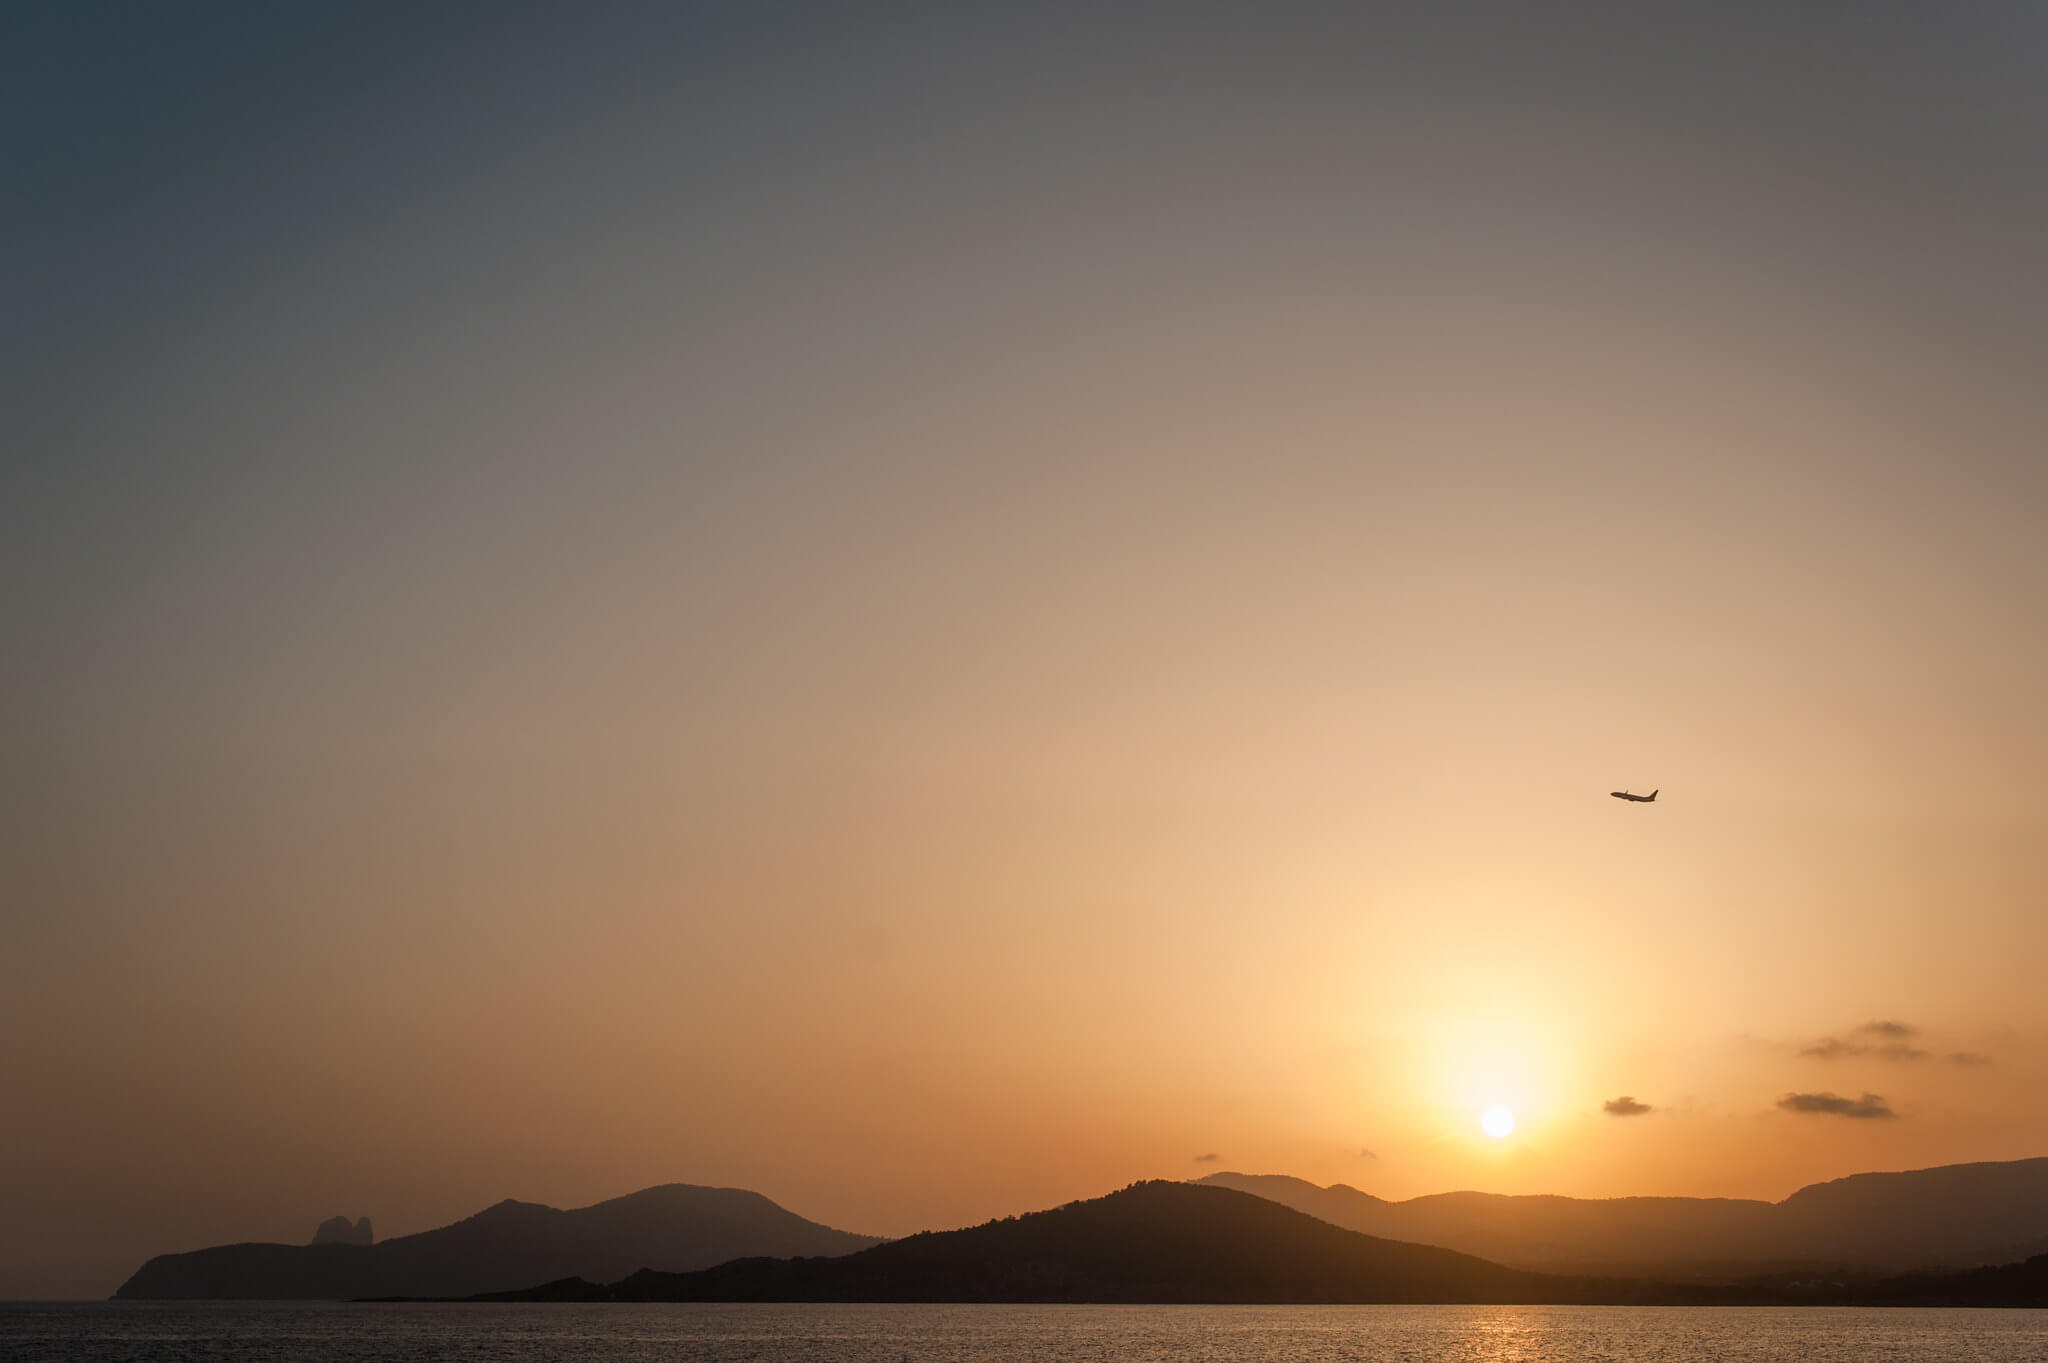 https://www.white-ibiza.com/wp-content/uploads/2020/03/ibiza-sunsets-experimental-beach-ibiza-2020-06.jpg